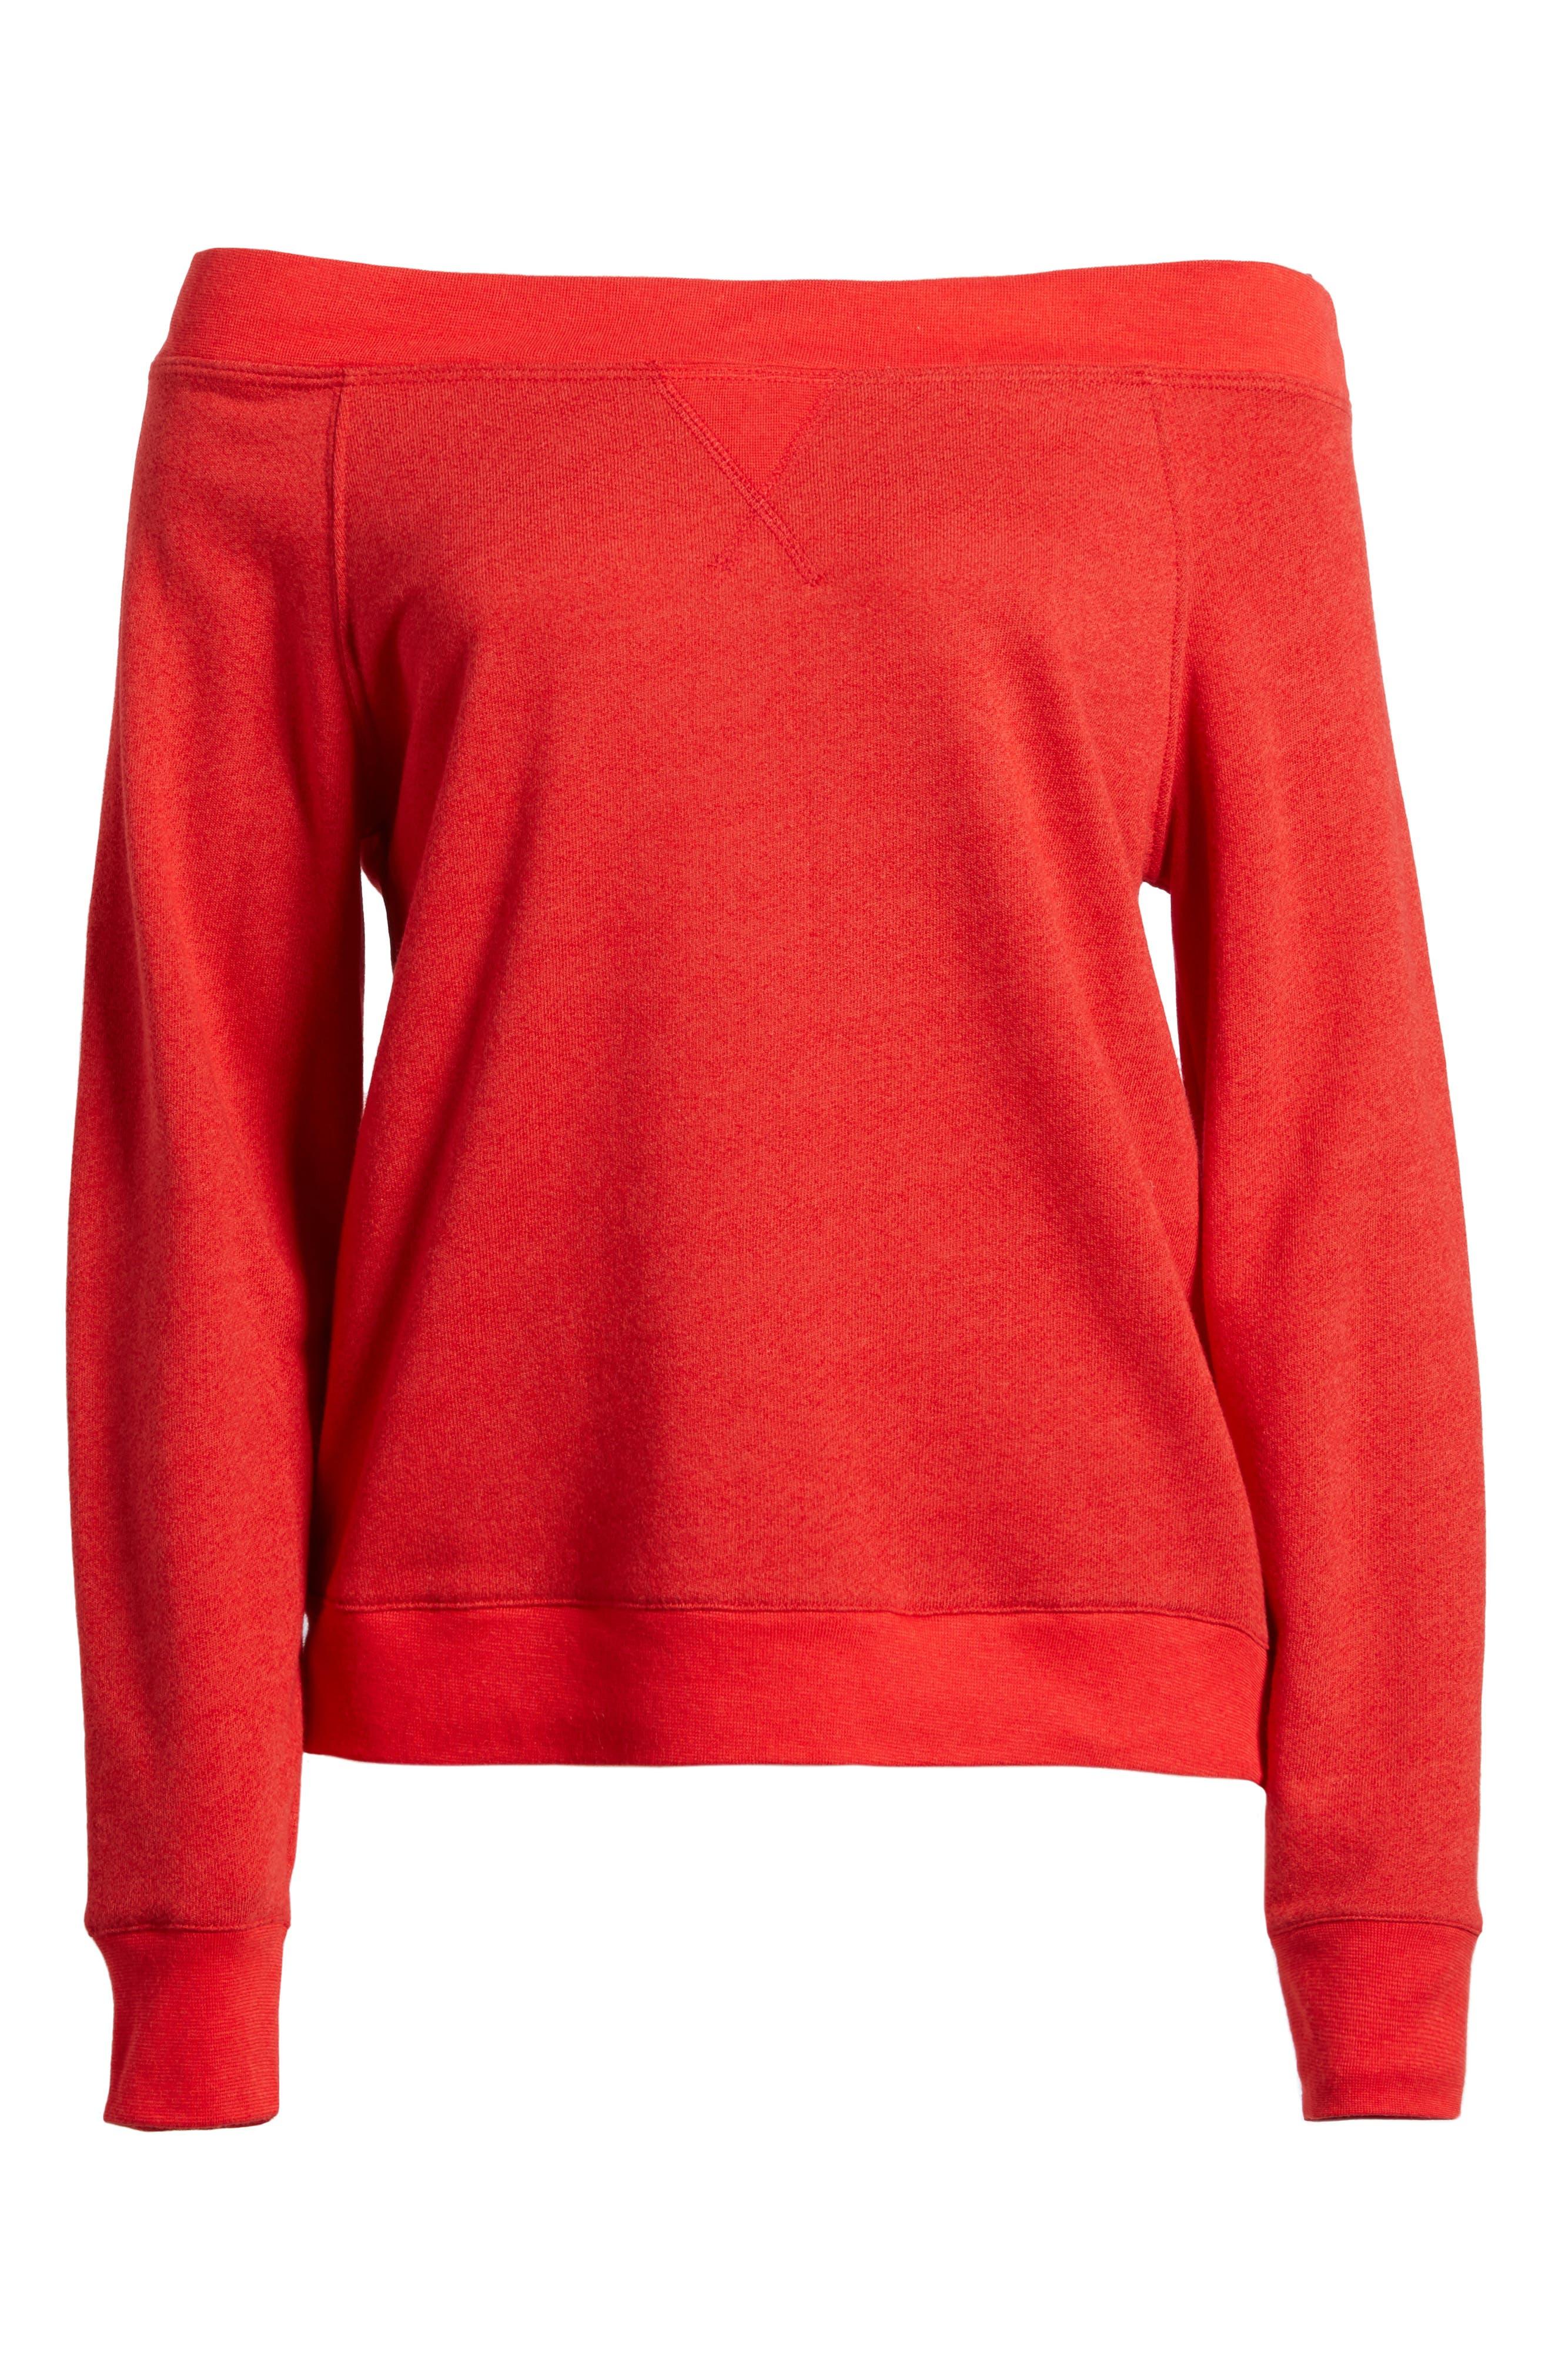 Off the Shoulder Sweatshirt,                             Alternate thumbnail 6, color,                             Red Barbados